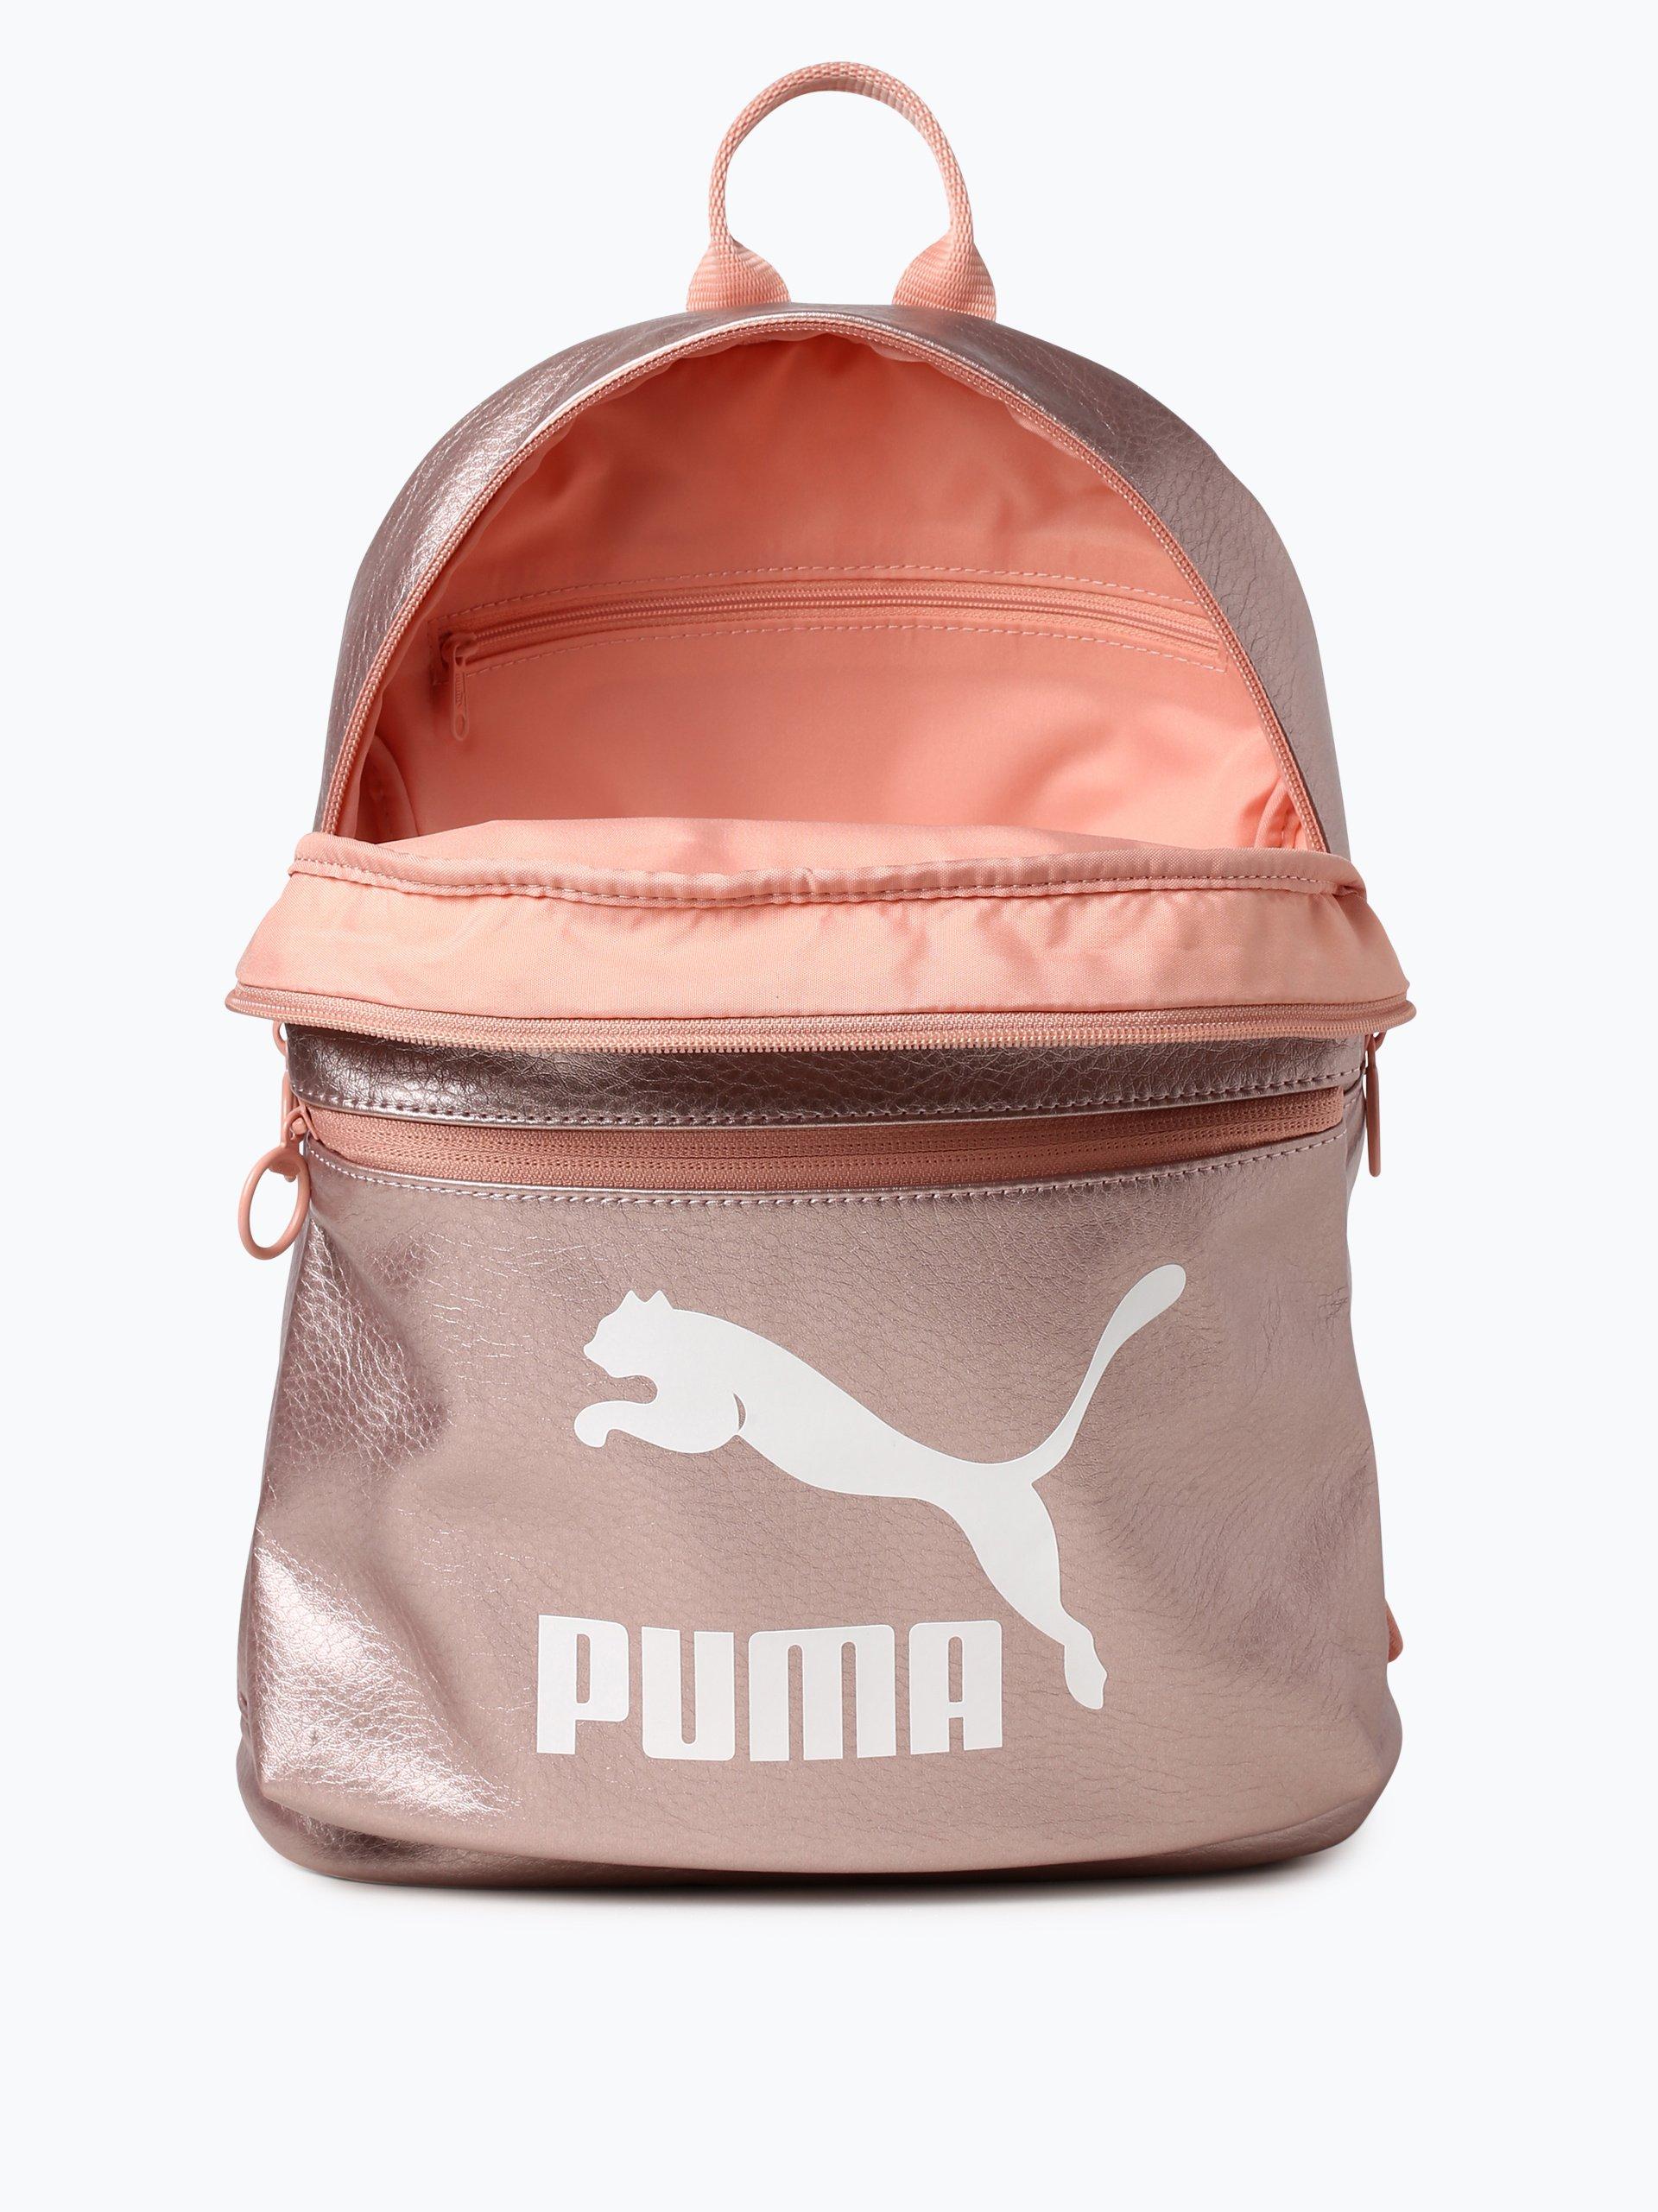 puma damen rucksack rosa bedruckt online kaufen vangraaf com. Black Bedroom Furniture Sets. Home Design Ideas